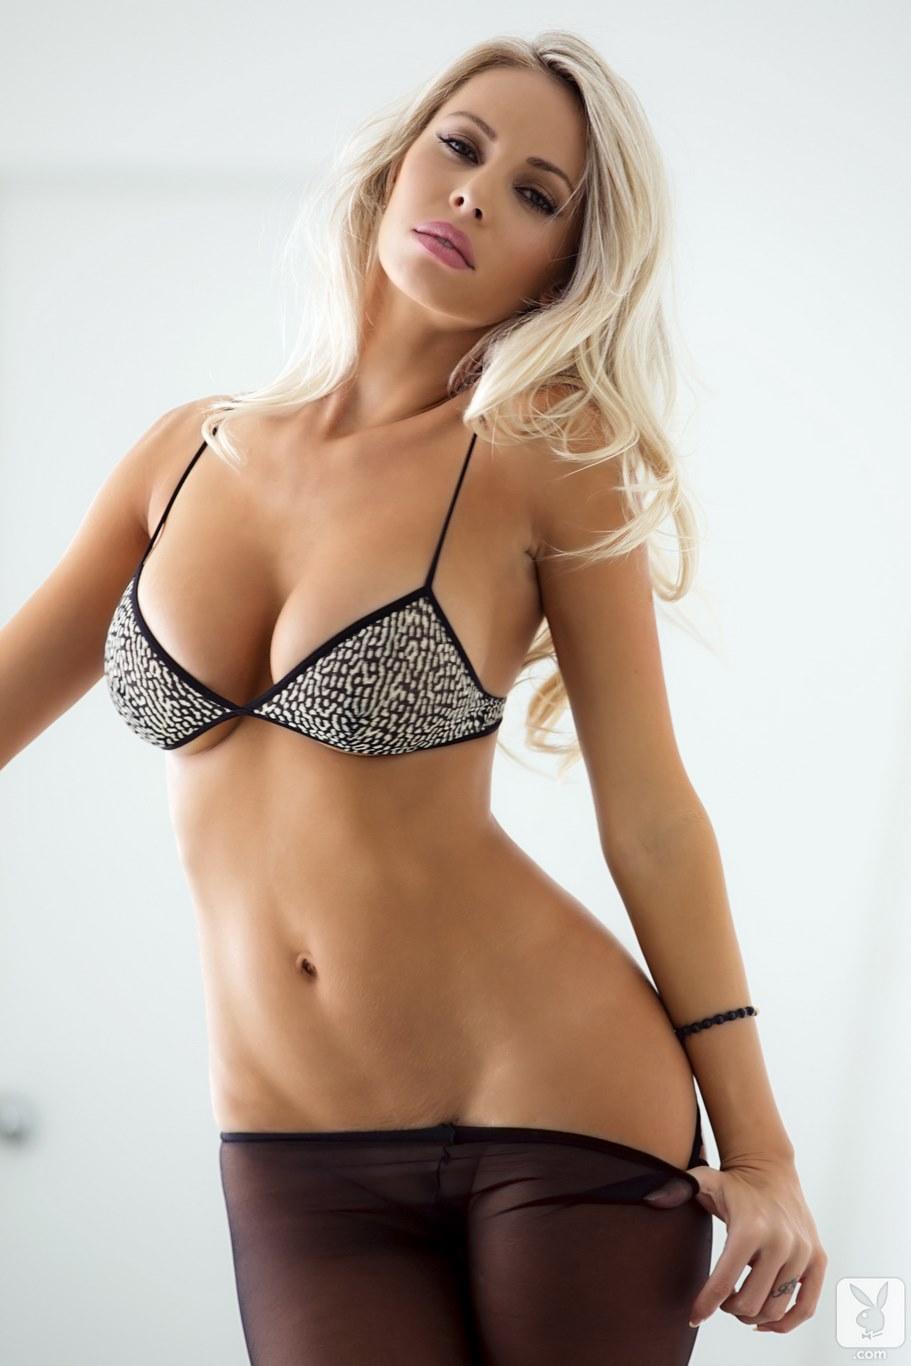 mature bellissime nude